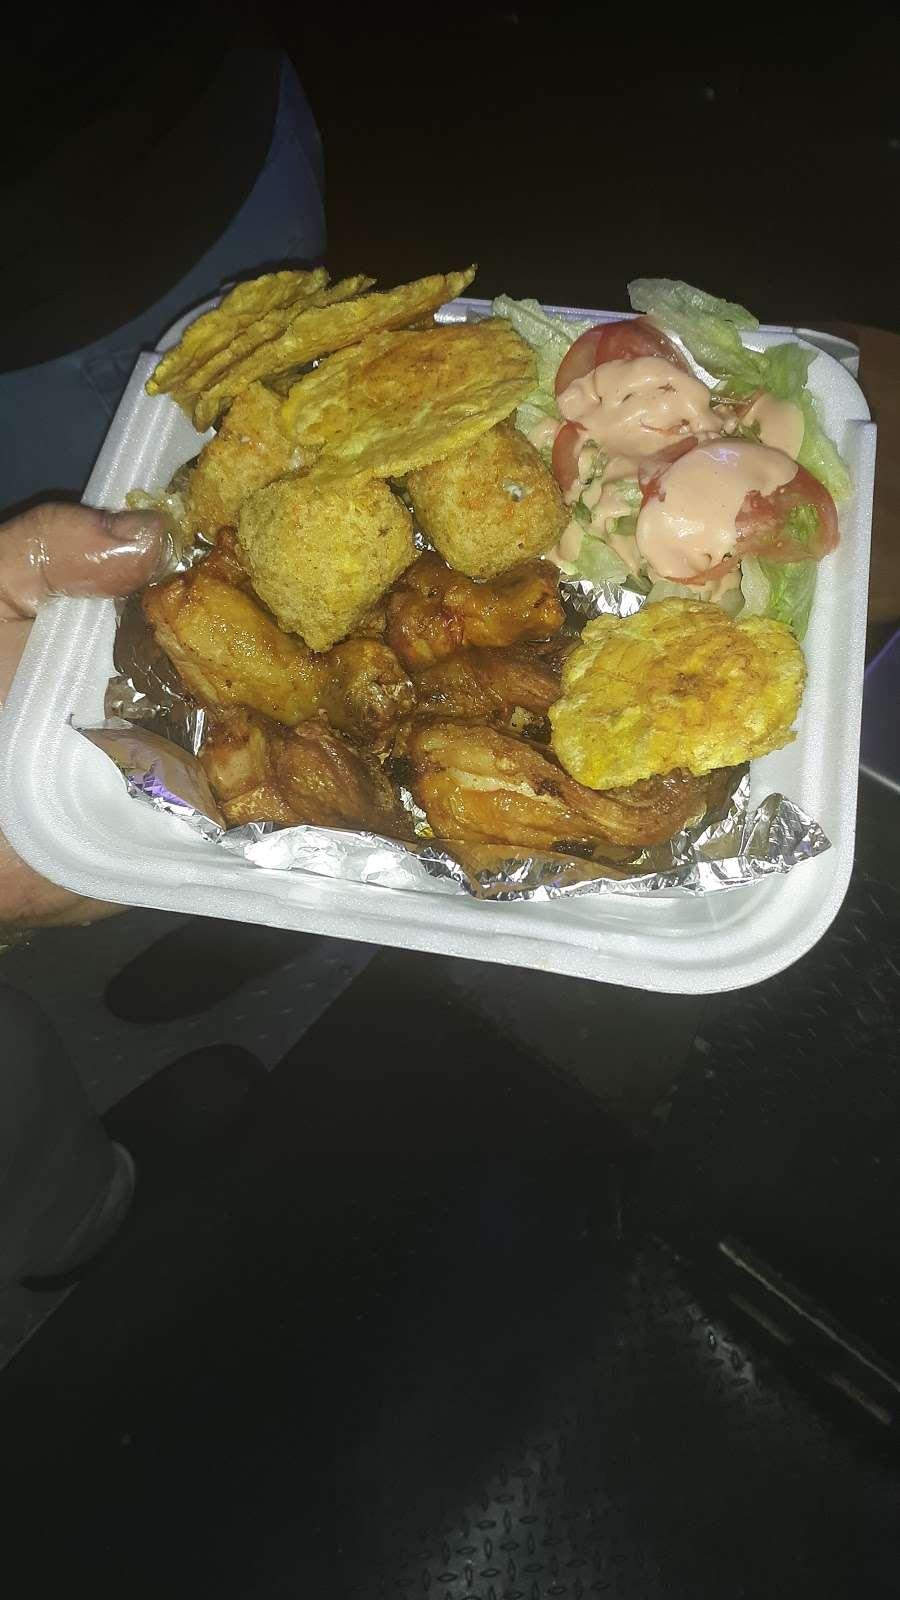 lareños hot dog - restaurant  | Photo 1 of 2 | Address: 1301 W Burnham St, Milwaukee, WI 53204, USA | Phone: (414) 595-5801